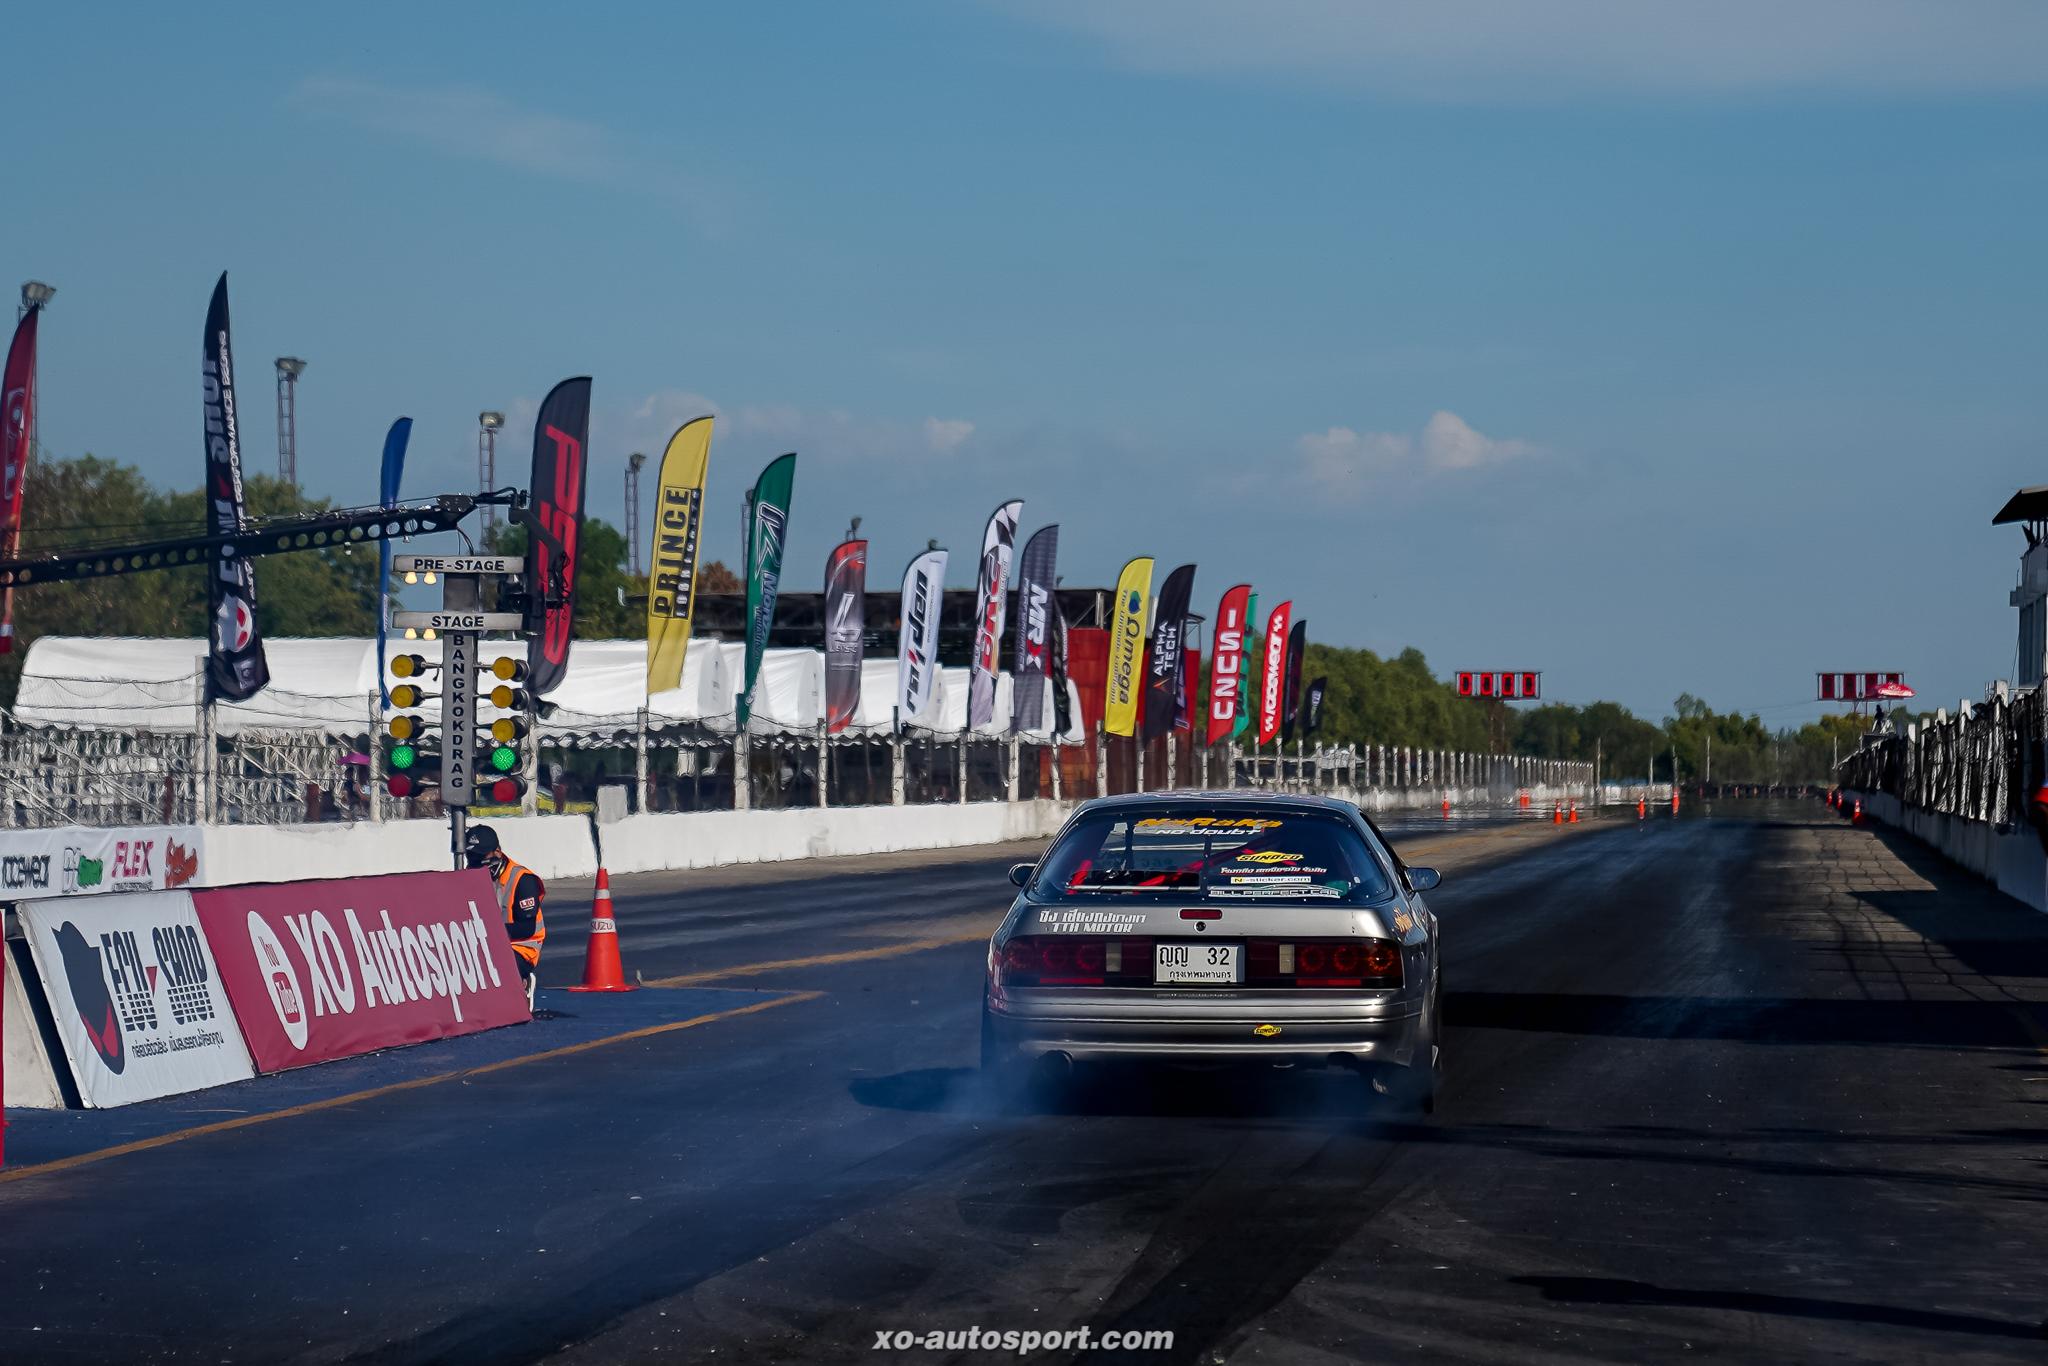 P and C Naraka Super 4 2WD Champion 11